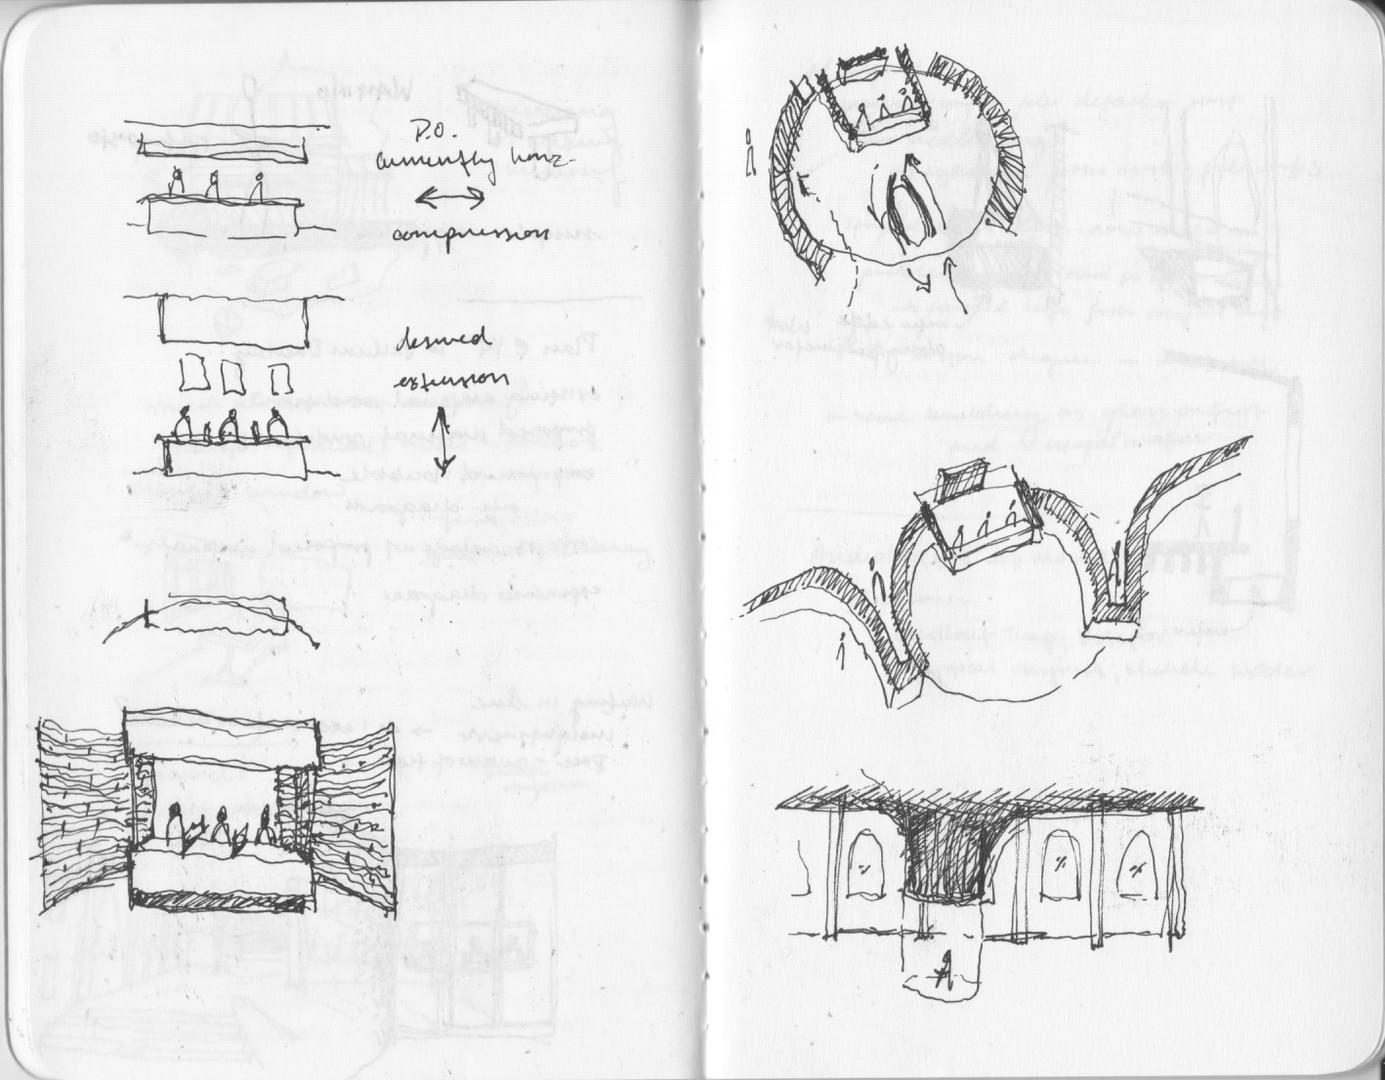 sketchbook 10 mini moleskine 2.jpeg